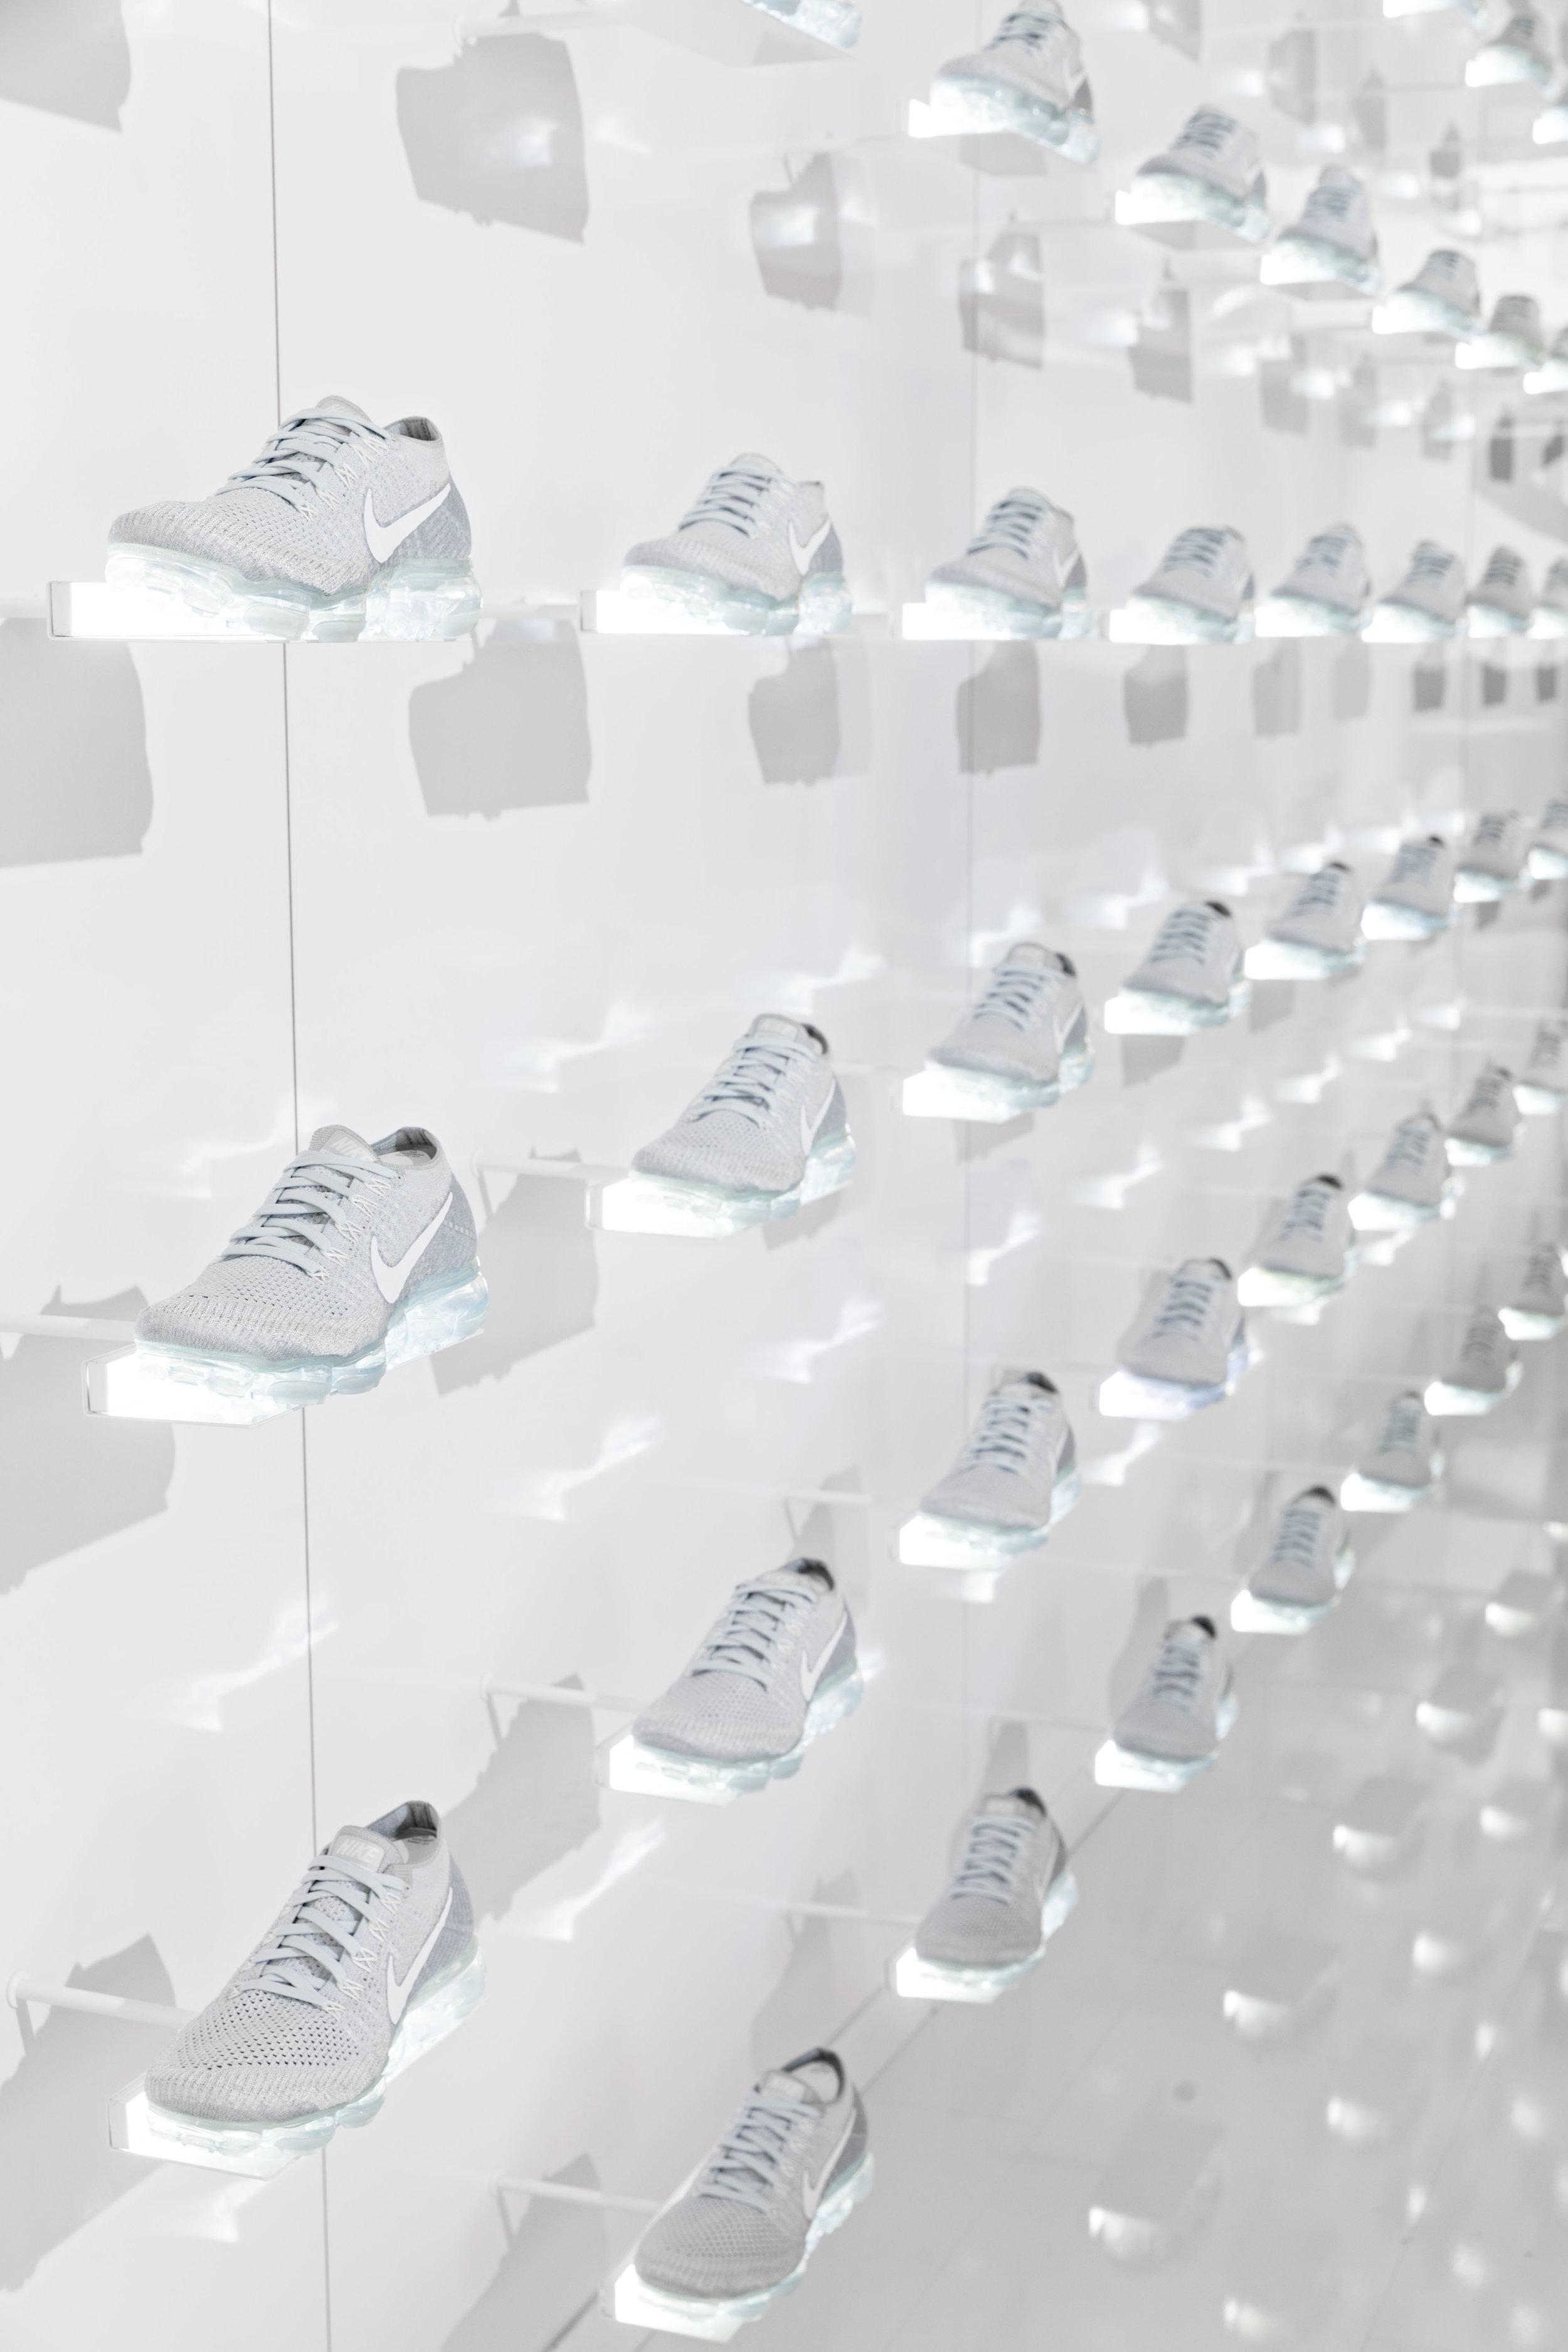 2017-03-26_Niketown_Vapormax_0161.jpg